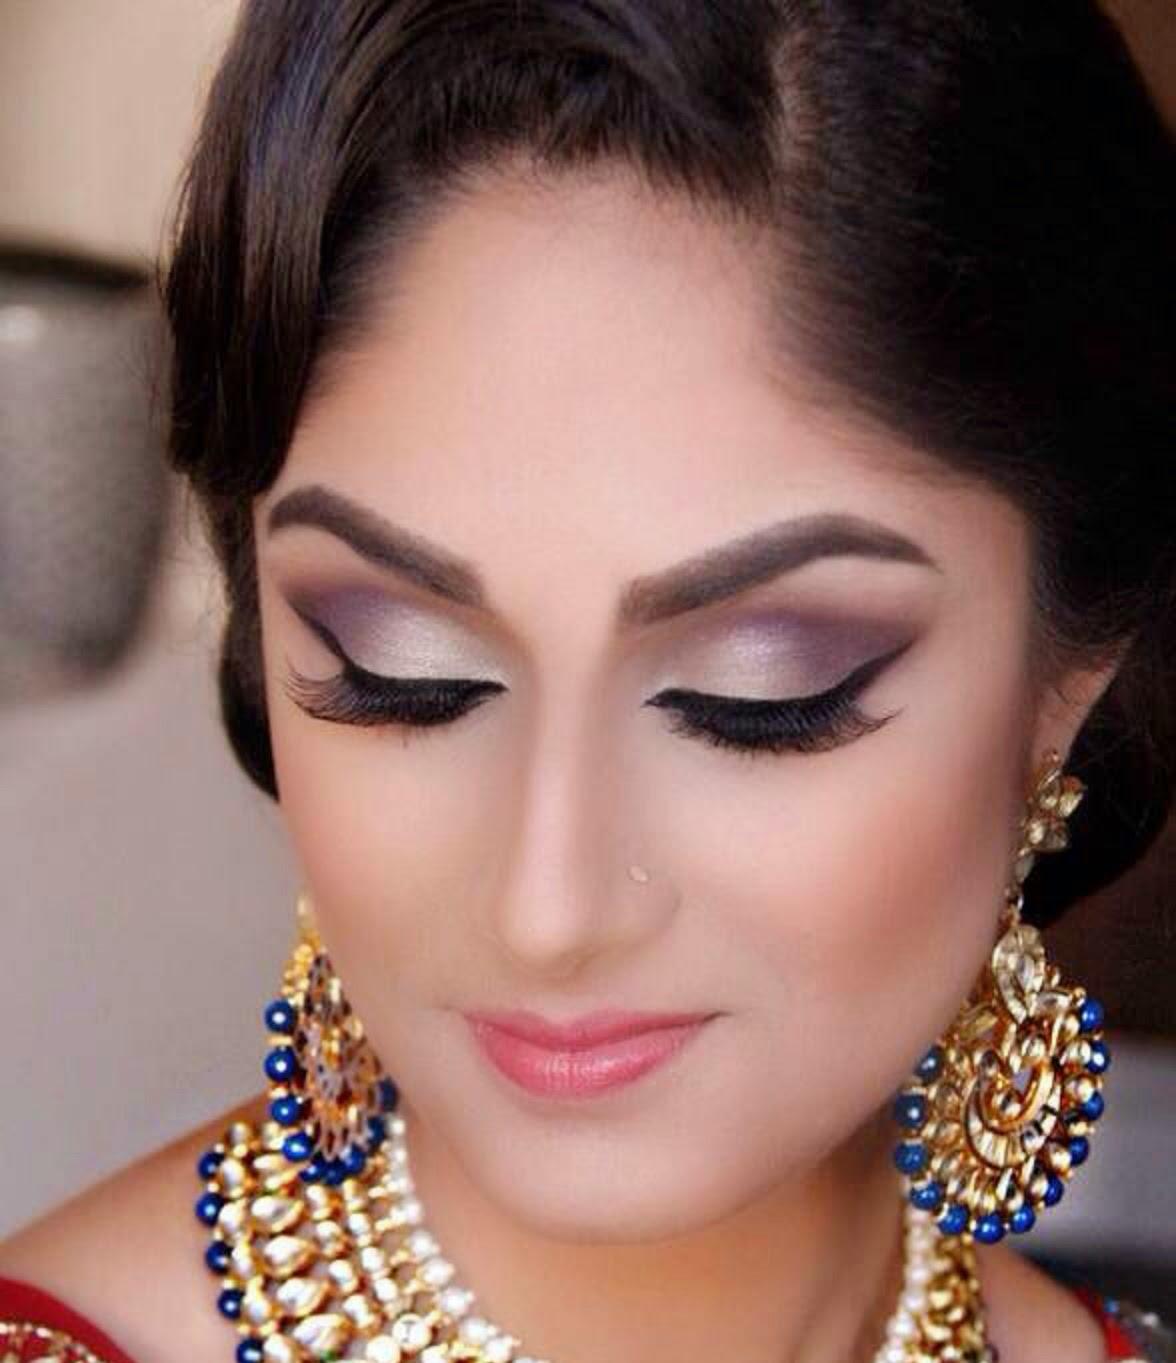 Bridal Makeup Name List : Most Popluar And New Look Bridal Wedding Makeup 2014-2015 ...